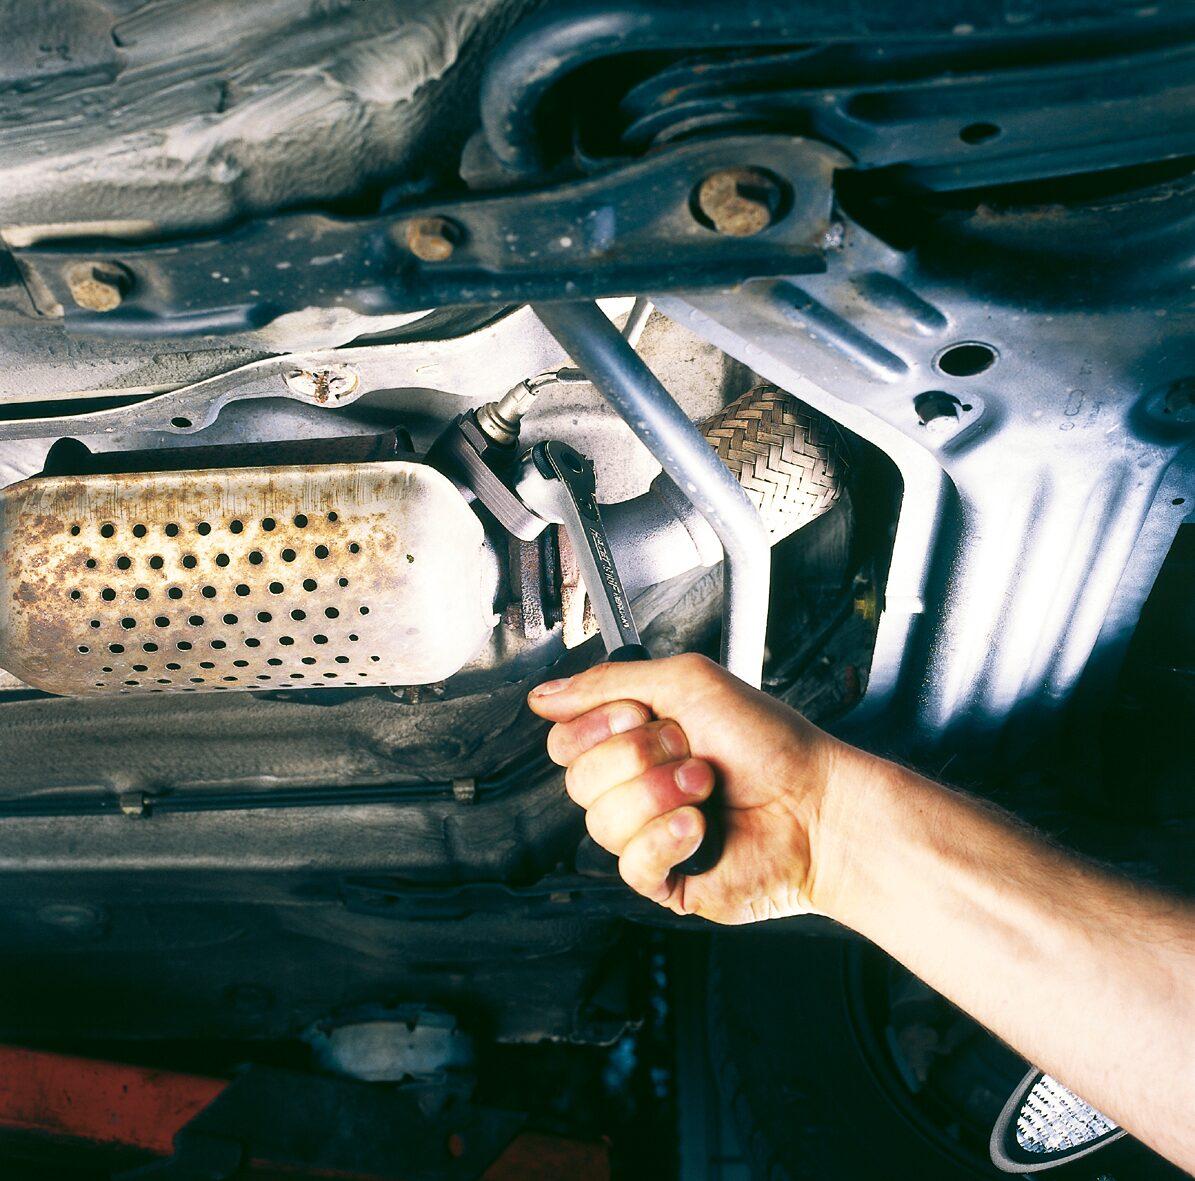 HAZET Lambda-Sonden Einsatz 4680-5 ∙ Doppel-Vierkant hohl 12,5 mm (1/2 Zoll) ∙ Außen-Sechskant Profil ∙ 22 mm